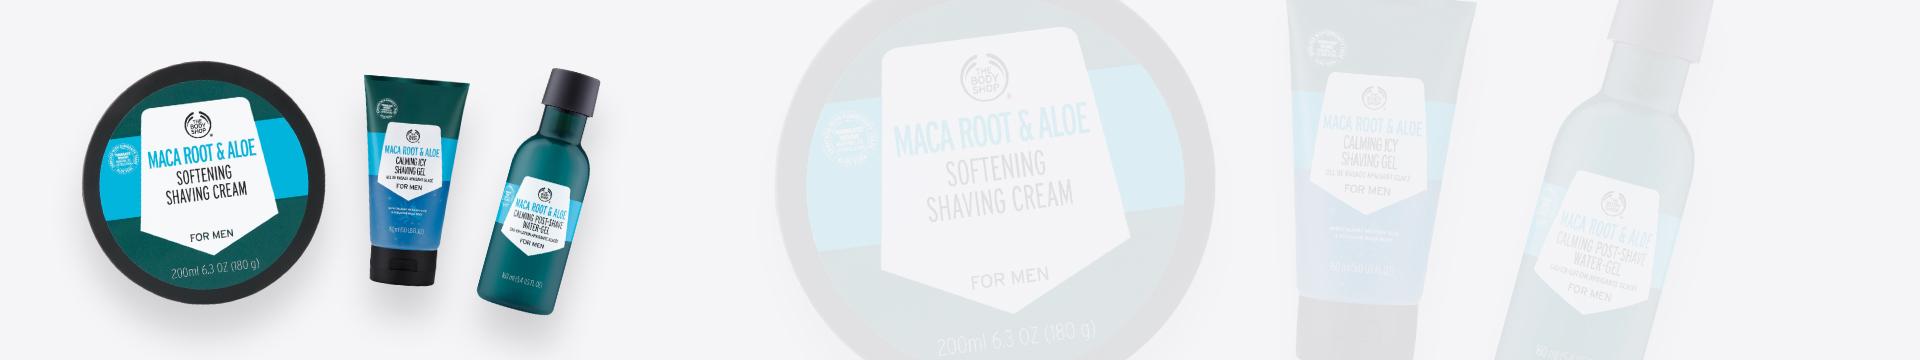 Shave & Beard Care